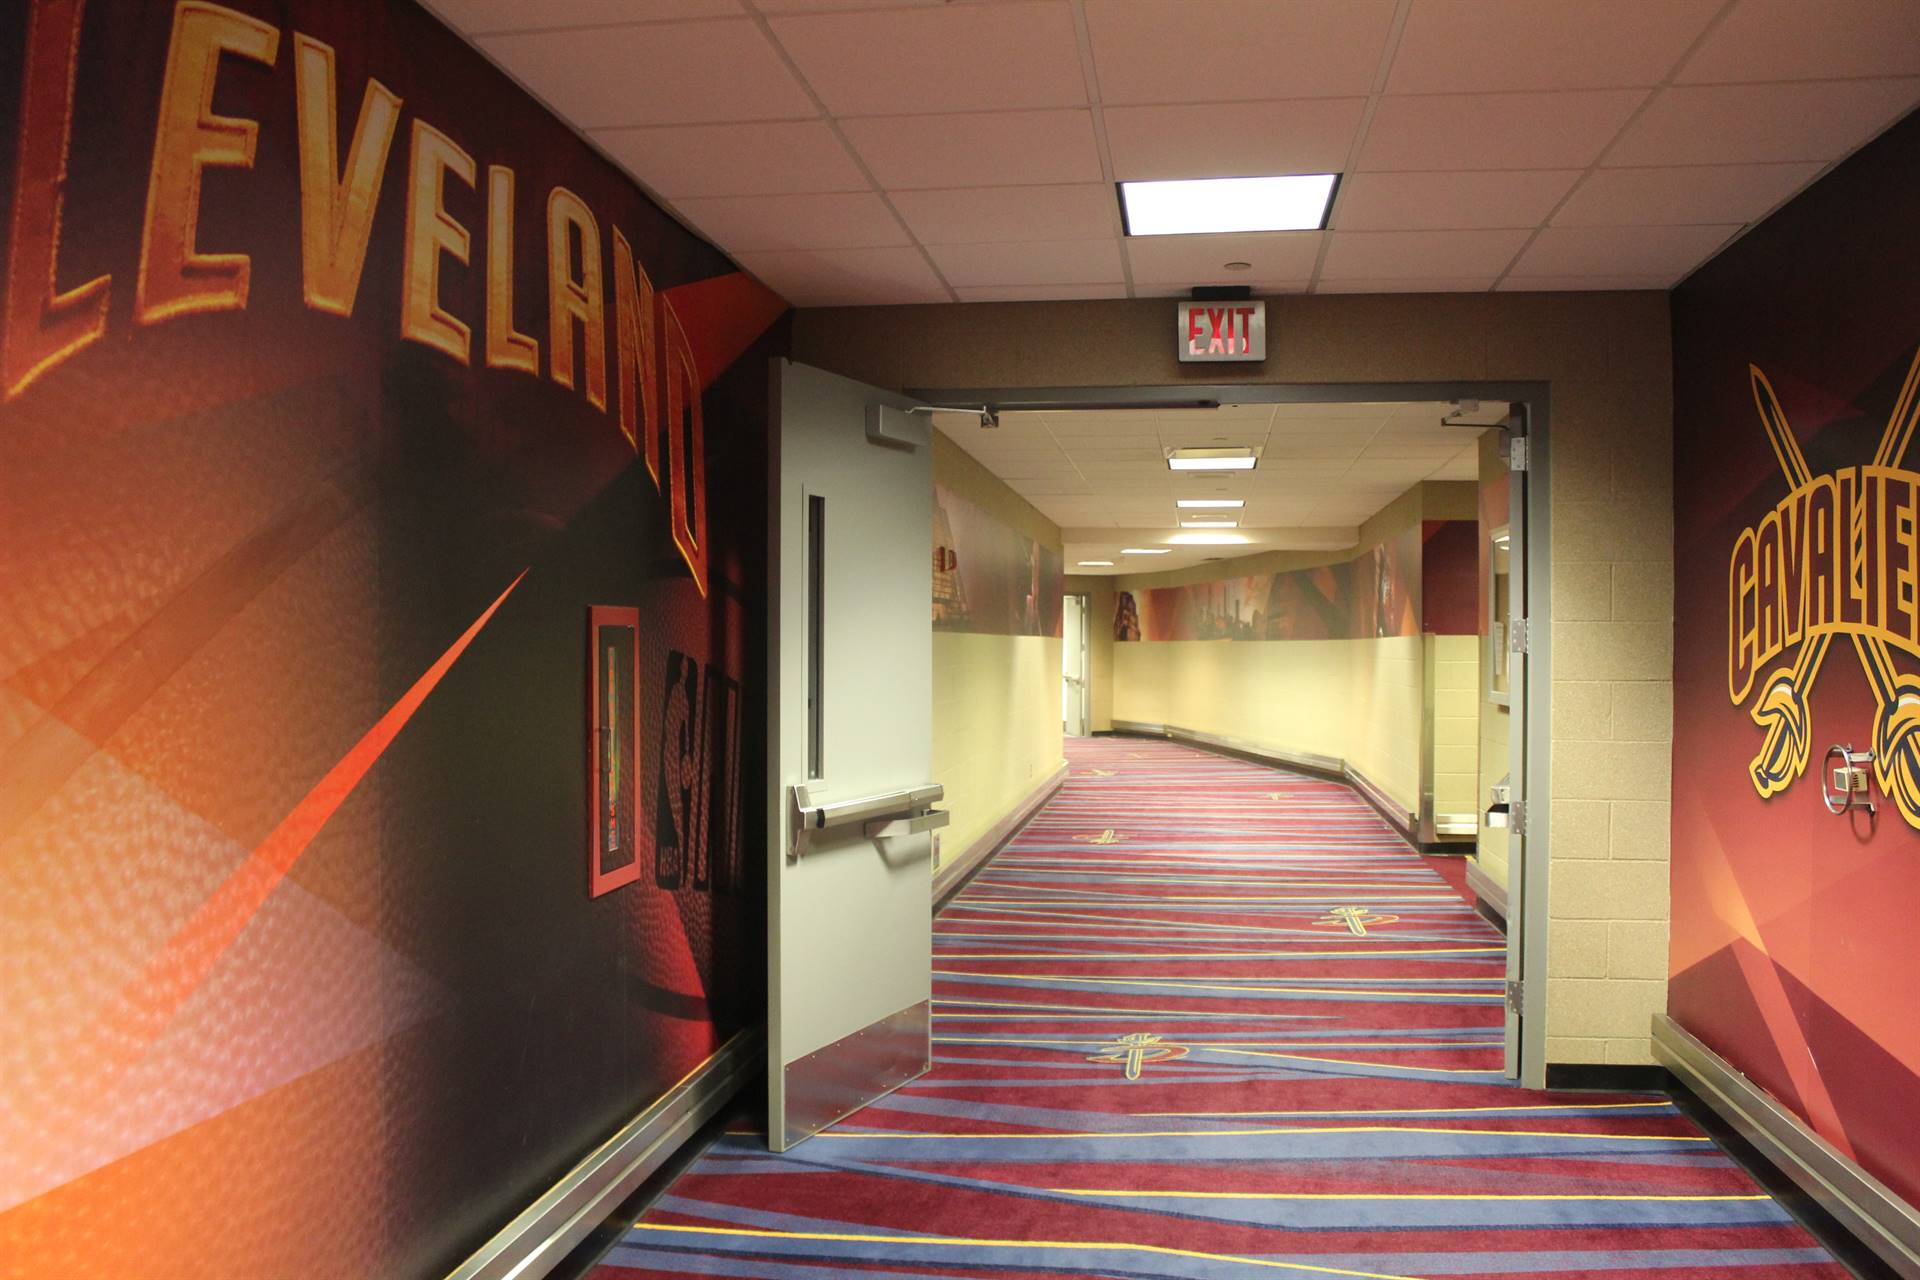 More Hallway